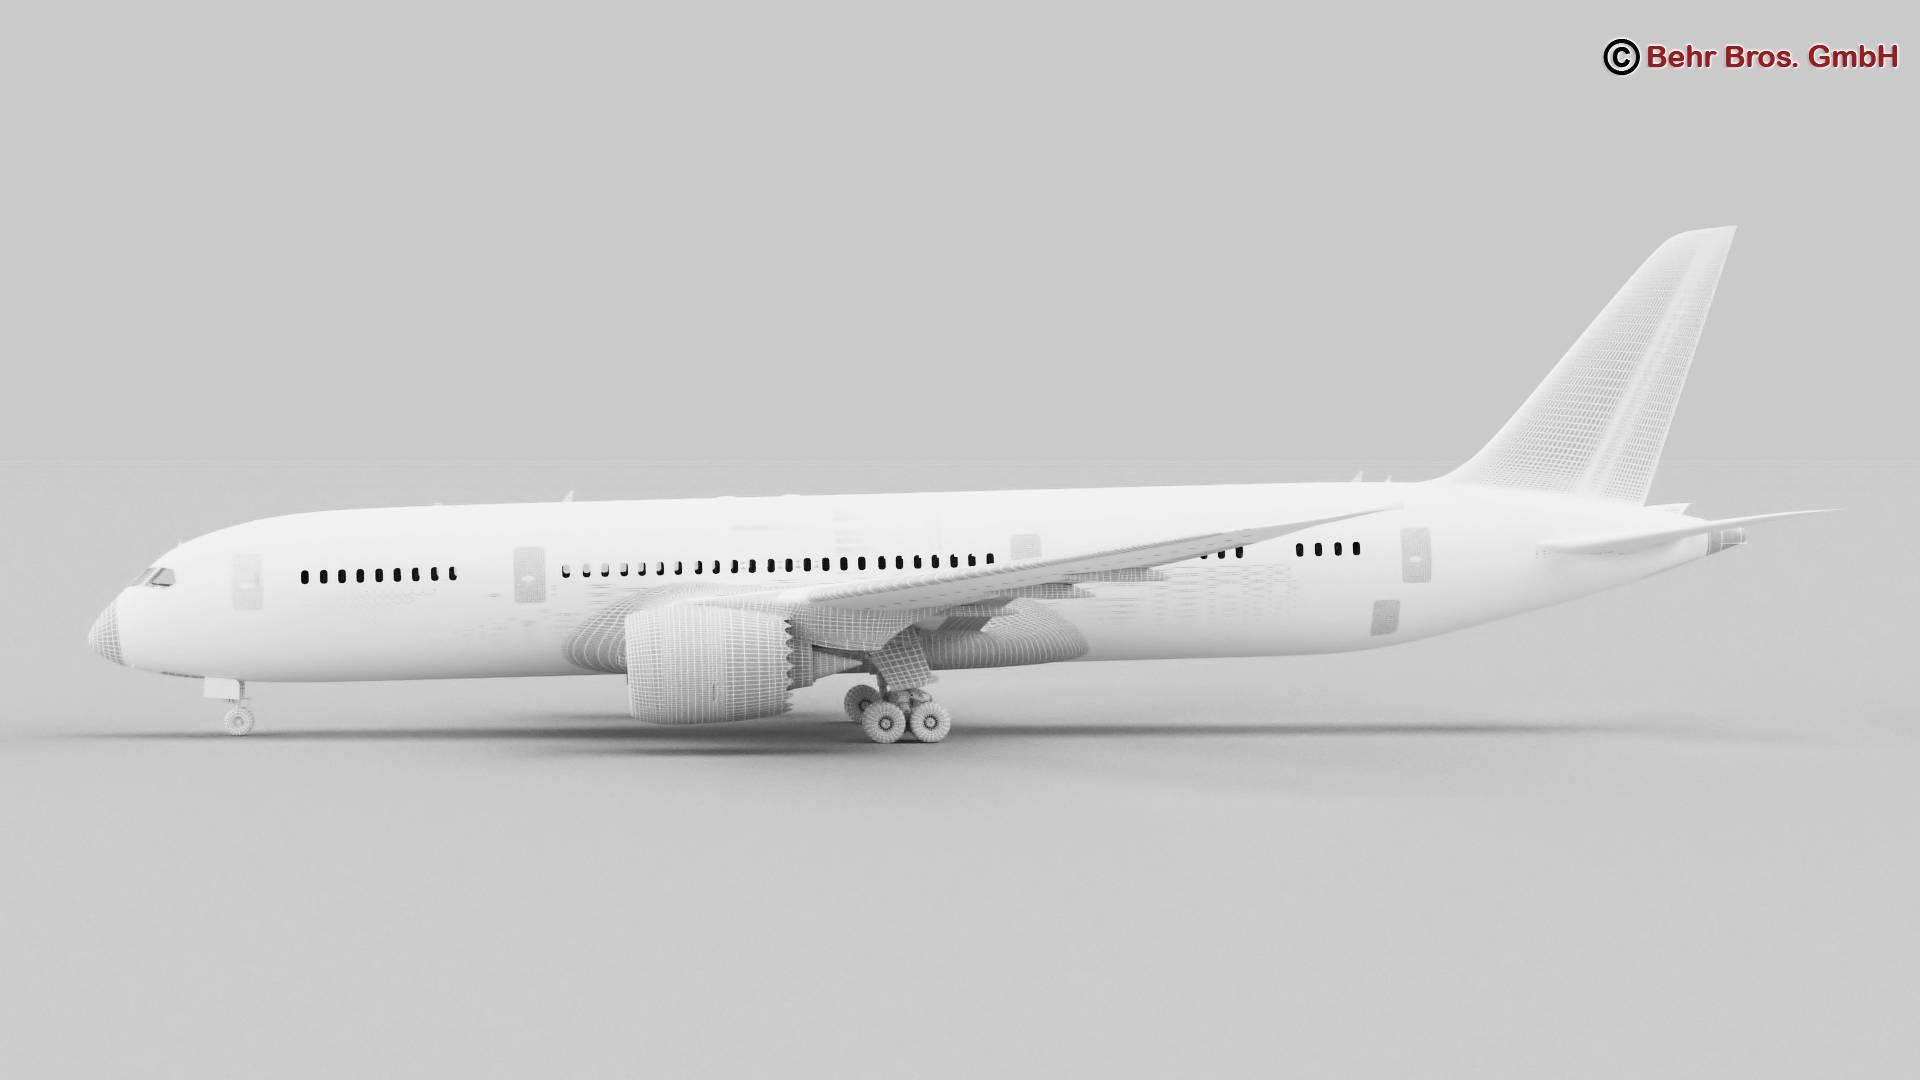 boeing 787-8 3d model 3ds max fbx c4d lwo ma mb obj 251373